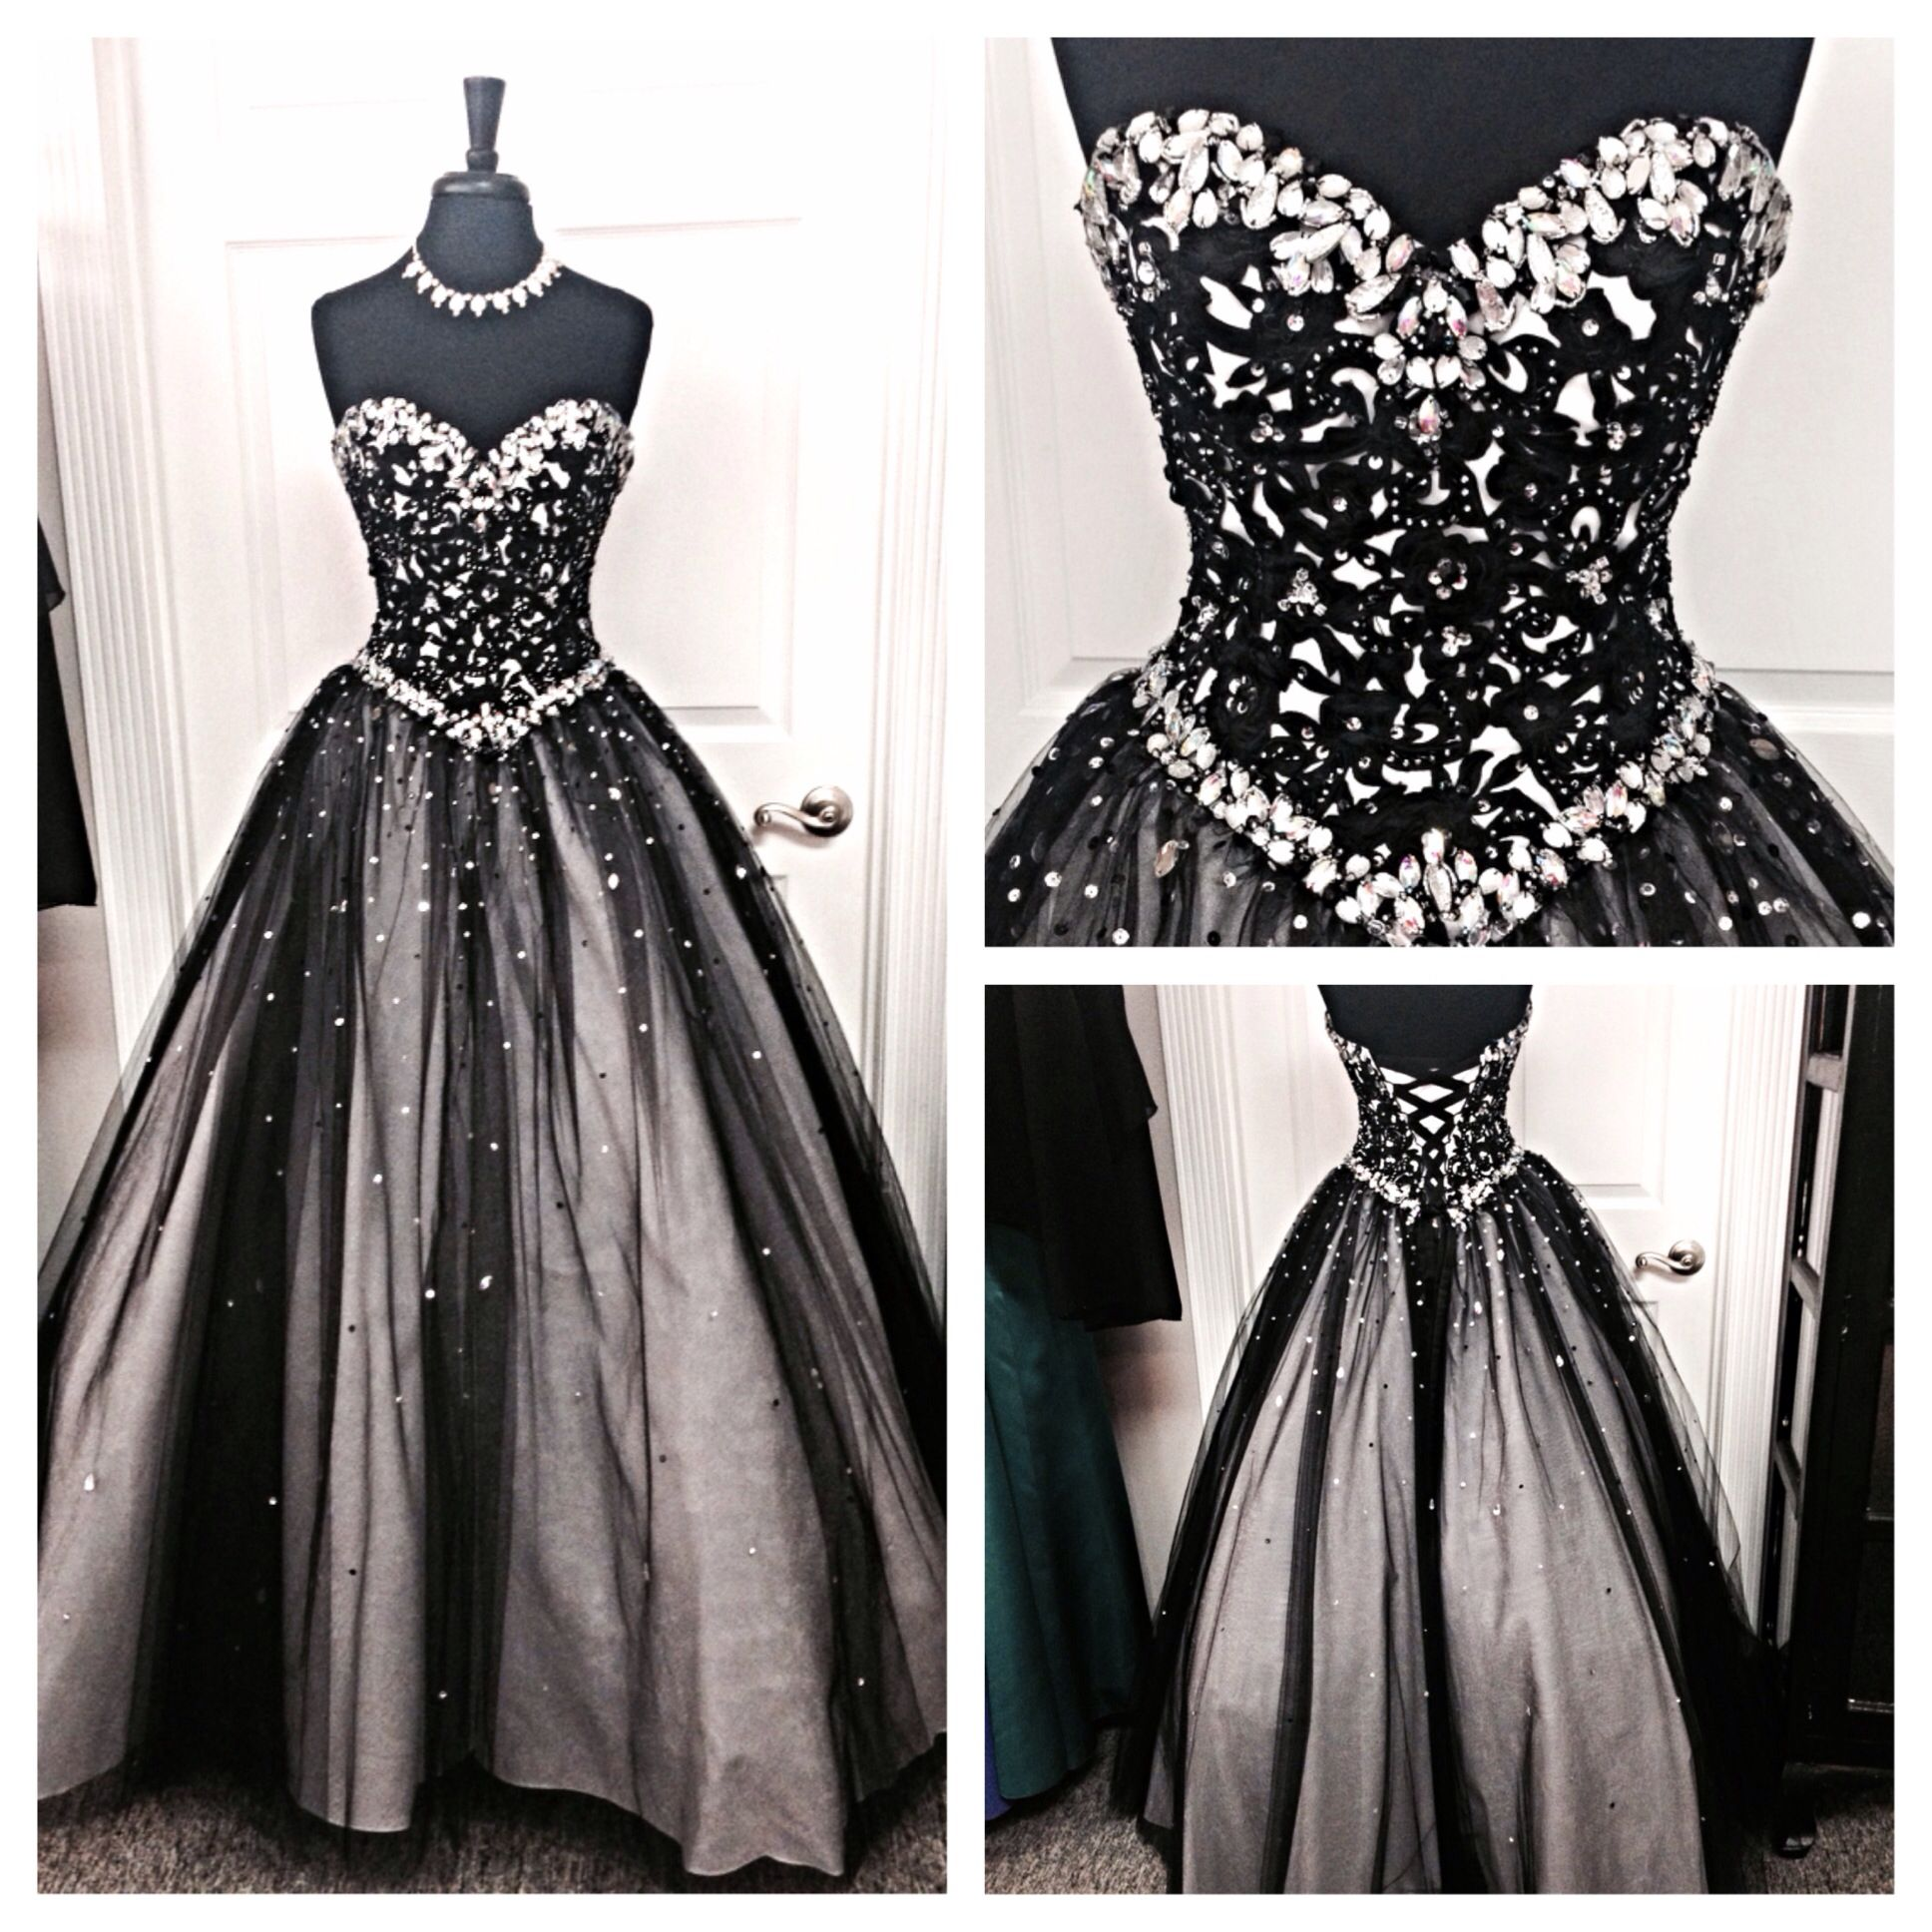 Fabulous black lace ball gown u dresses vestiu